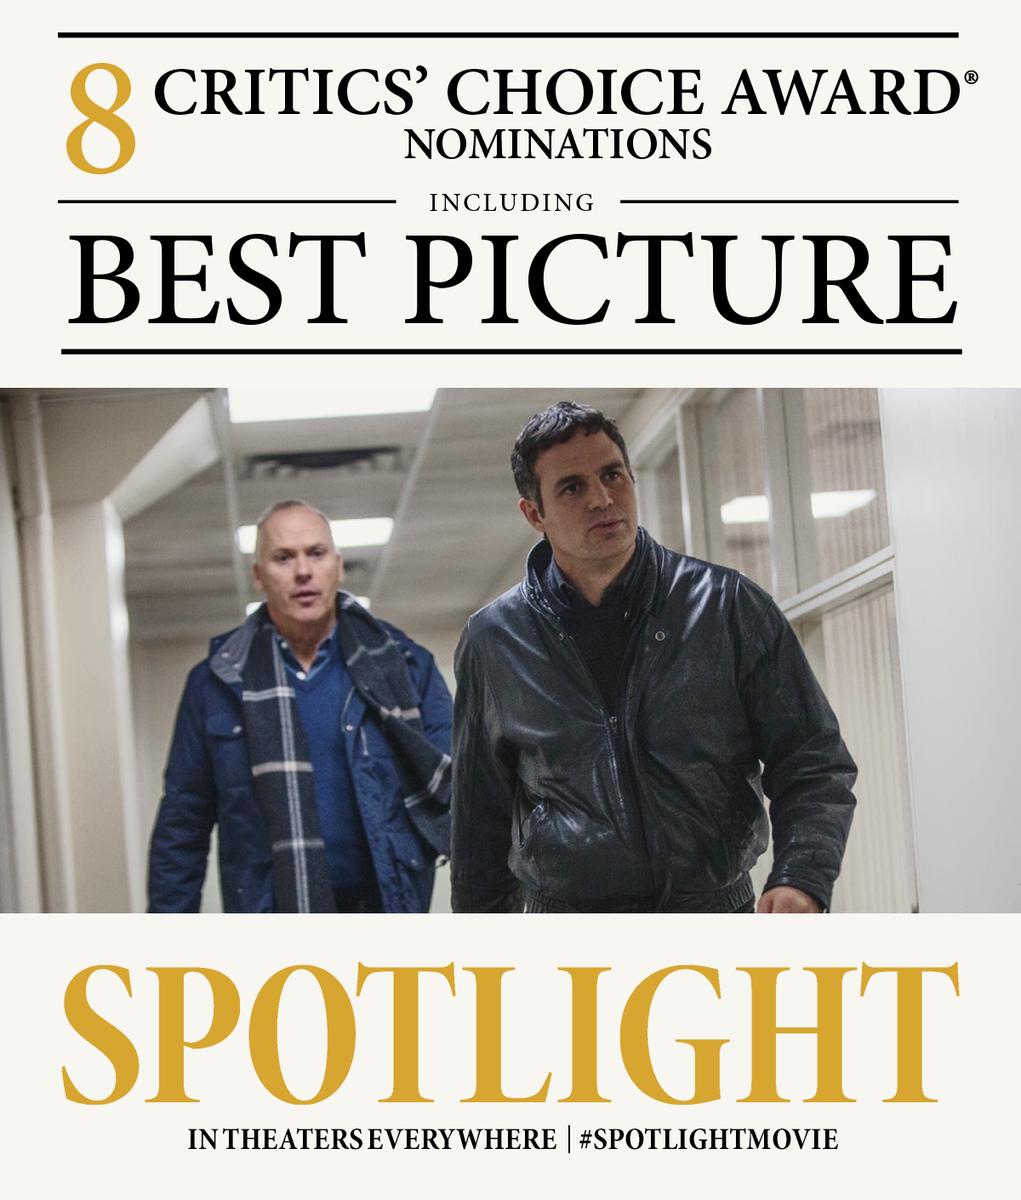 Crazy Eddie's Motie News: 'Spotlight' gets the recognition ...